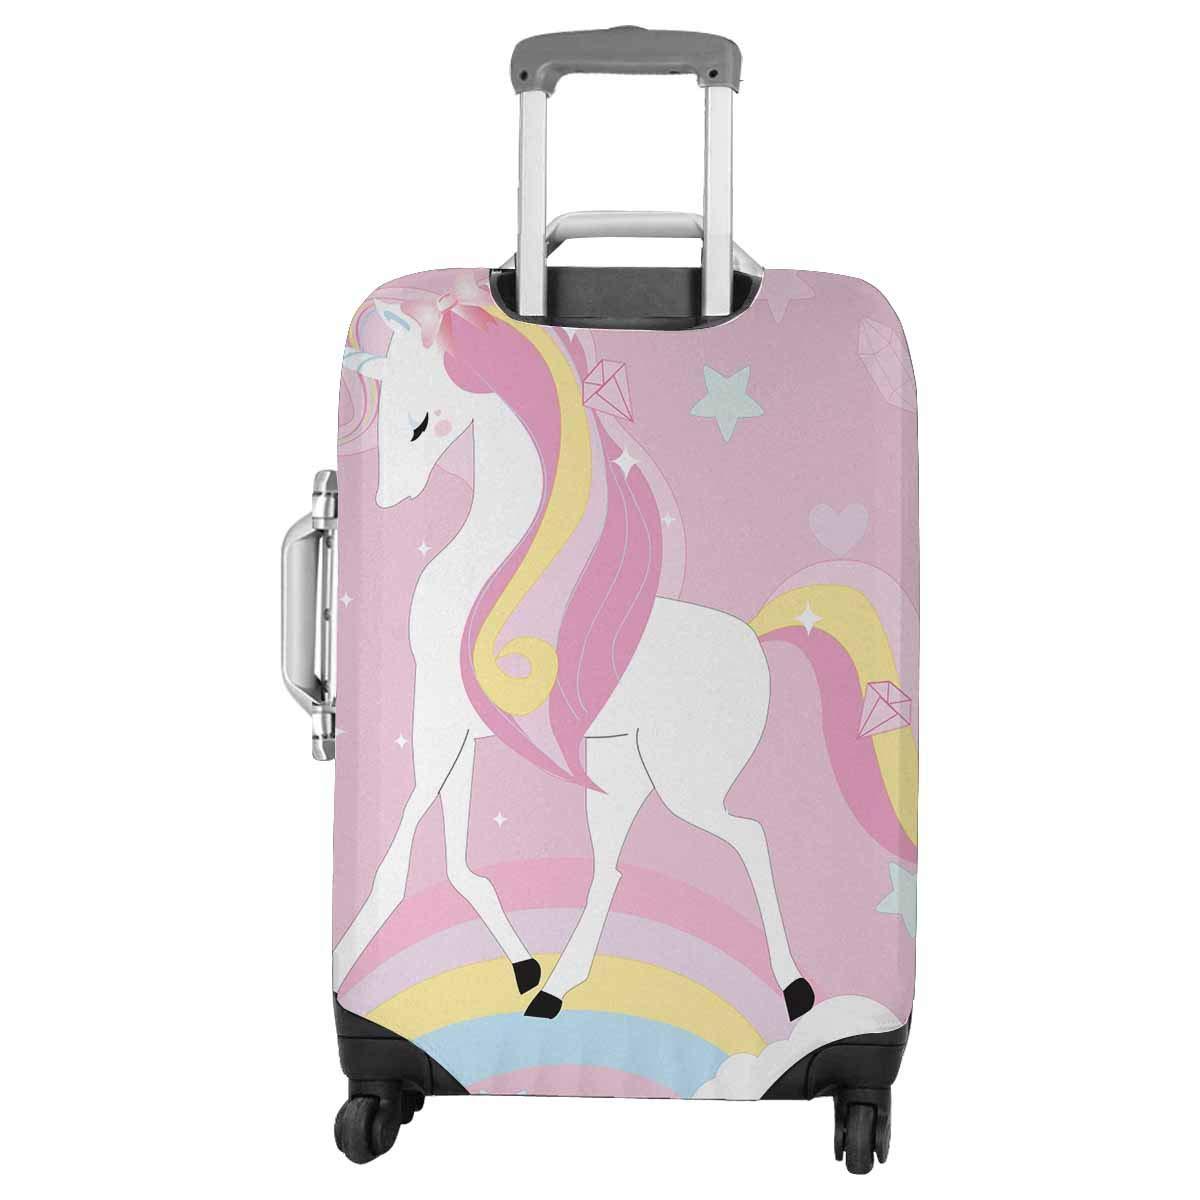 899edaaa3c71 Amazon.com | InterestPrint Vintage Cute Unicorn Cartoon Animal ...